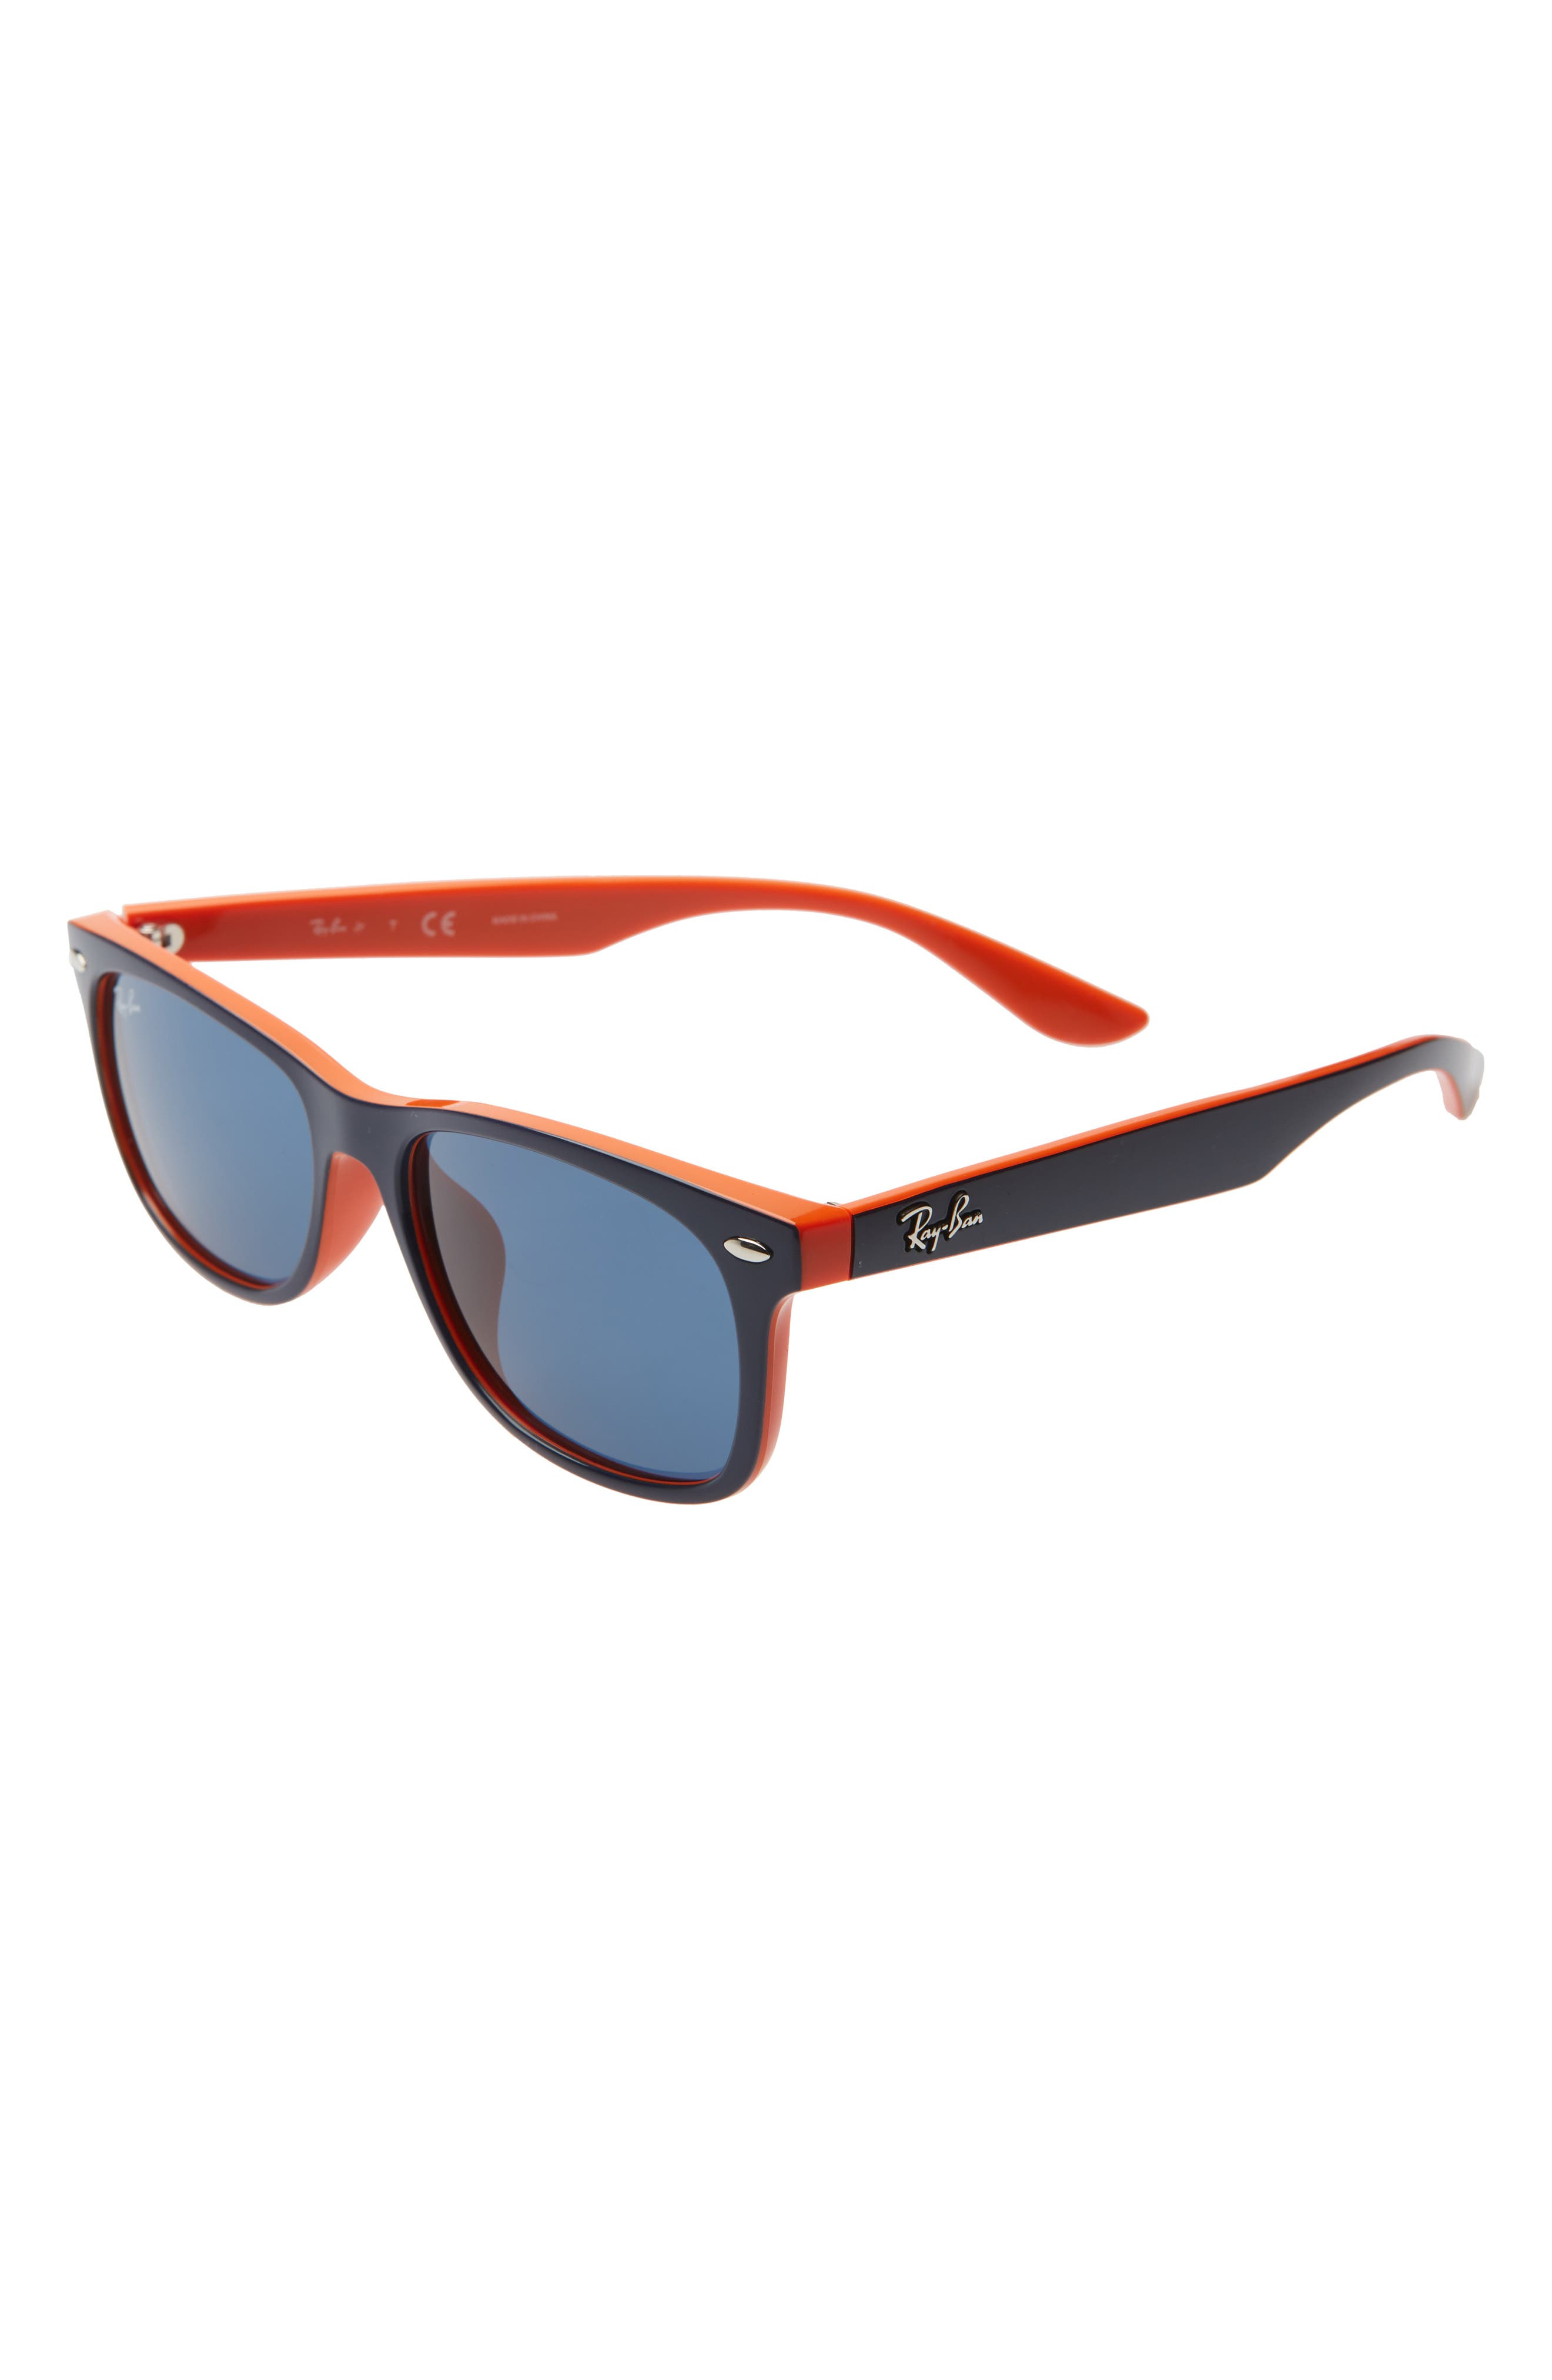 Girls RayBan Junior Wayfarer 50Mm Sunglasses  Top Blue Orange Blue Solid